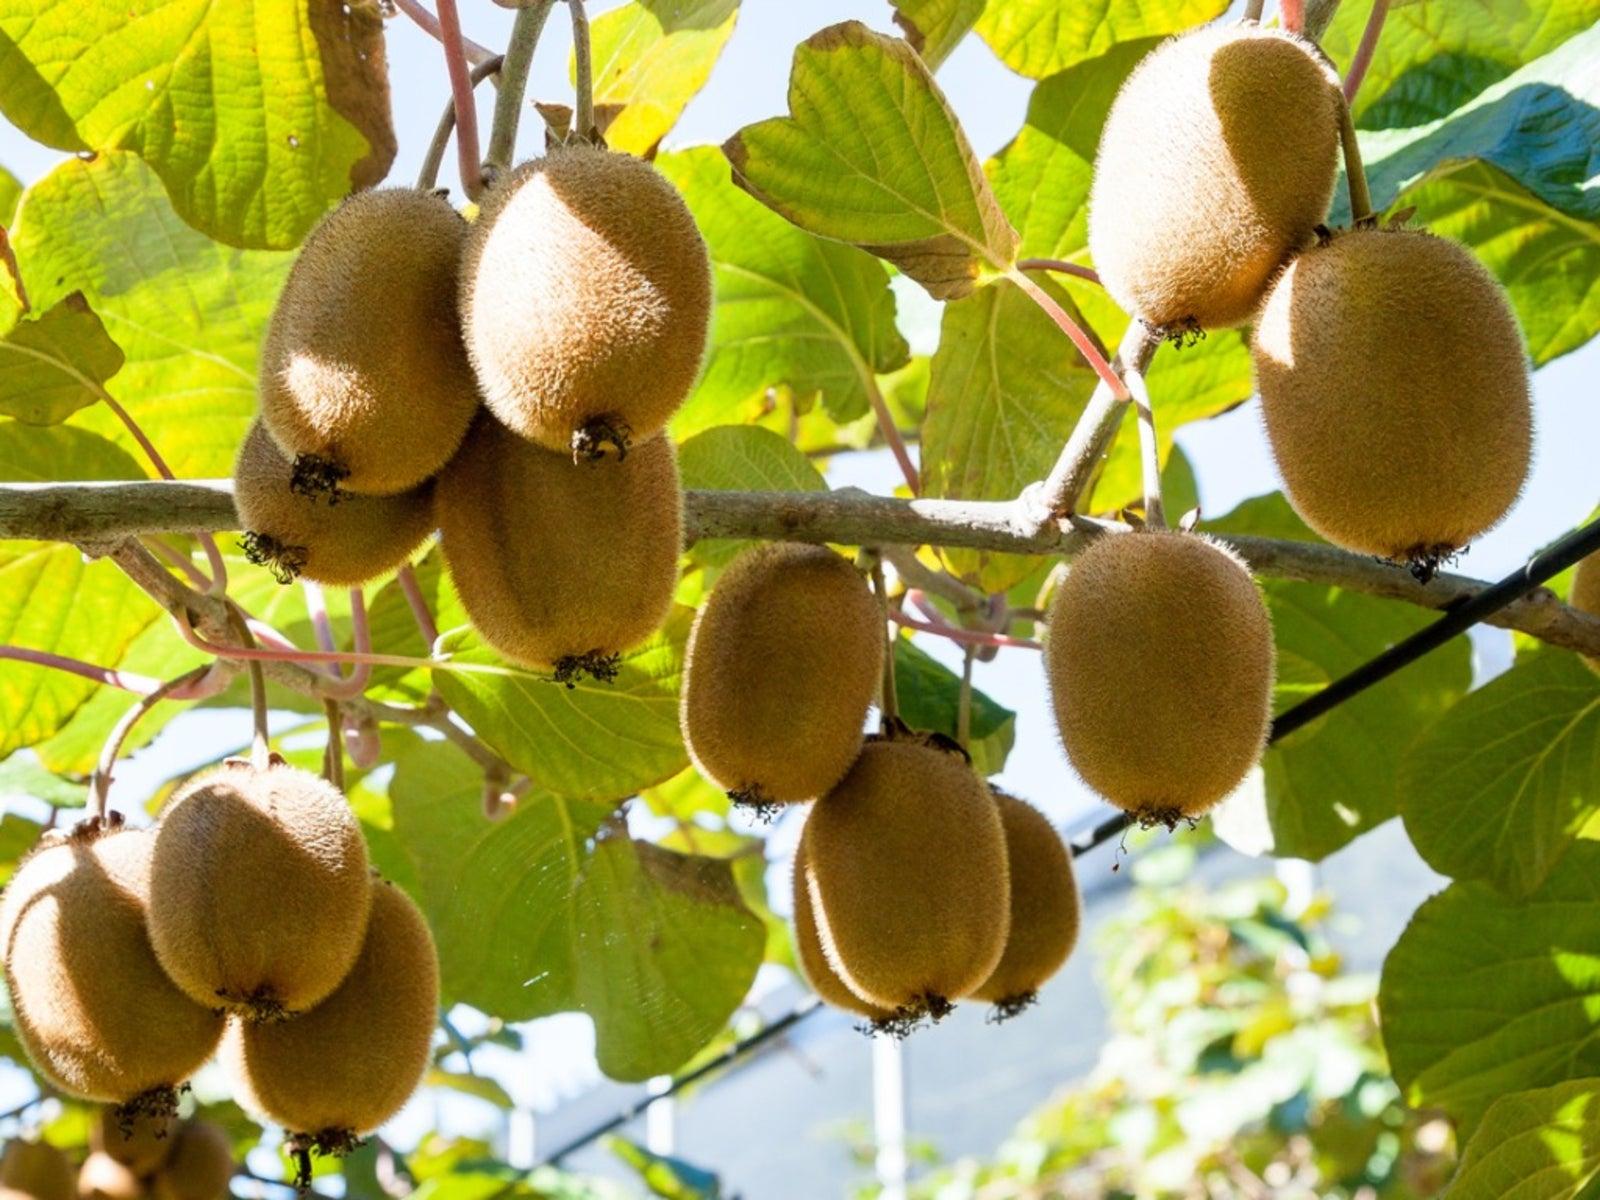 Kiwi Fruit Harvest - When And How To Pick A Kiwi